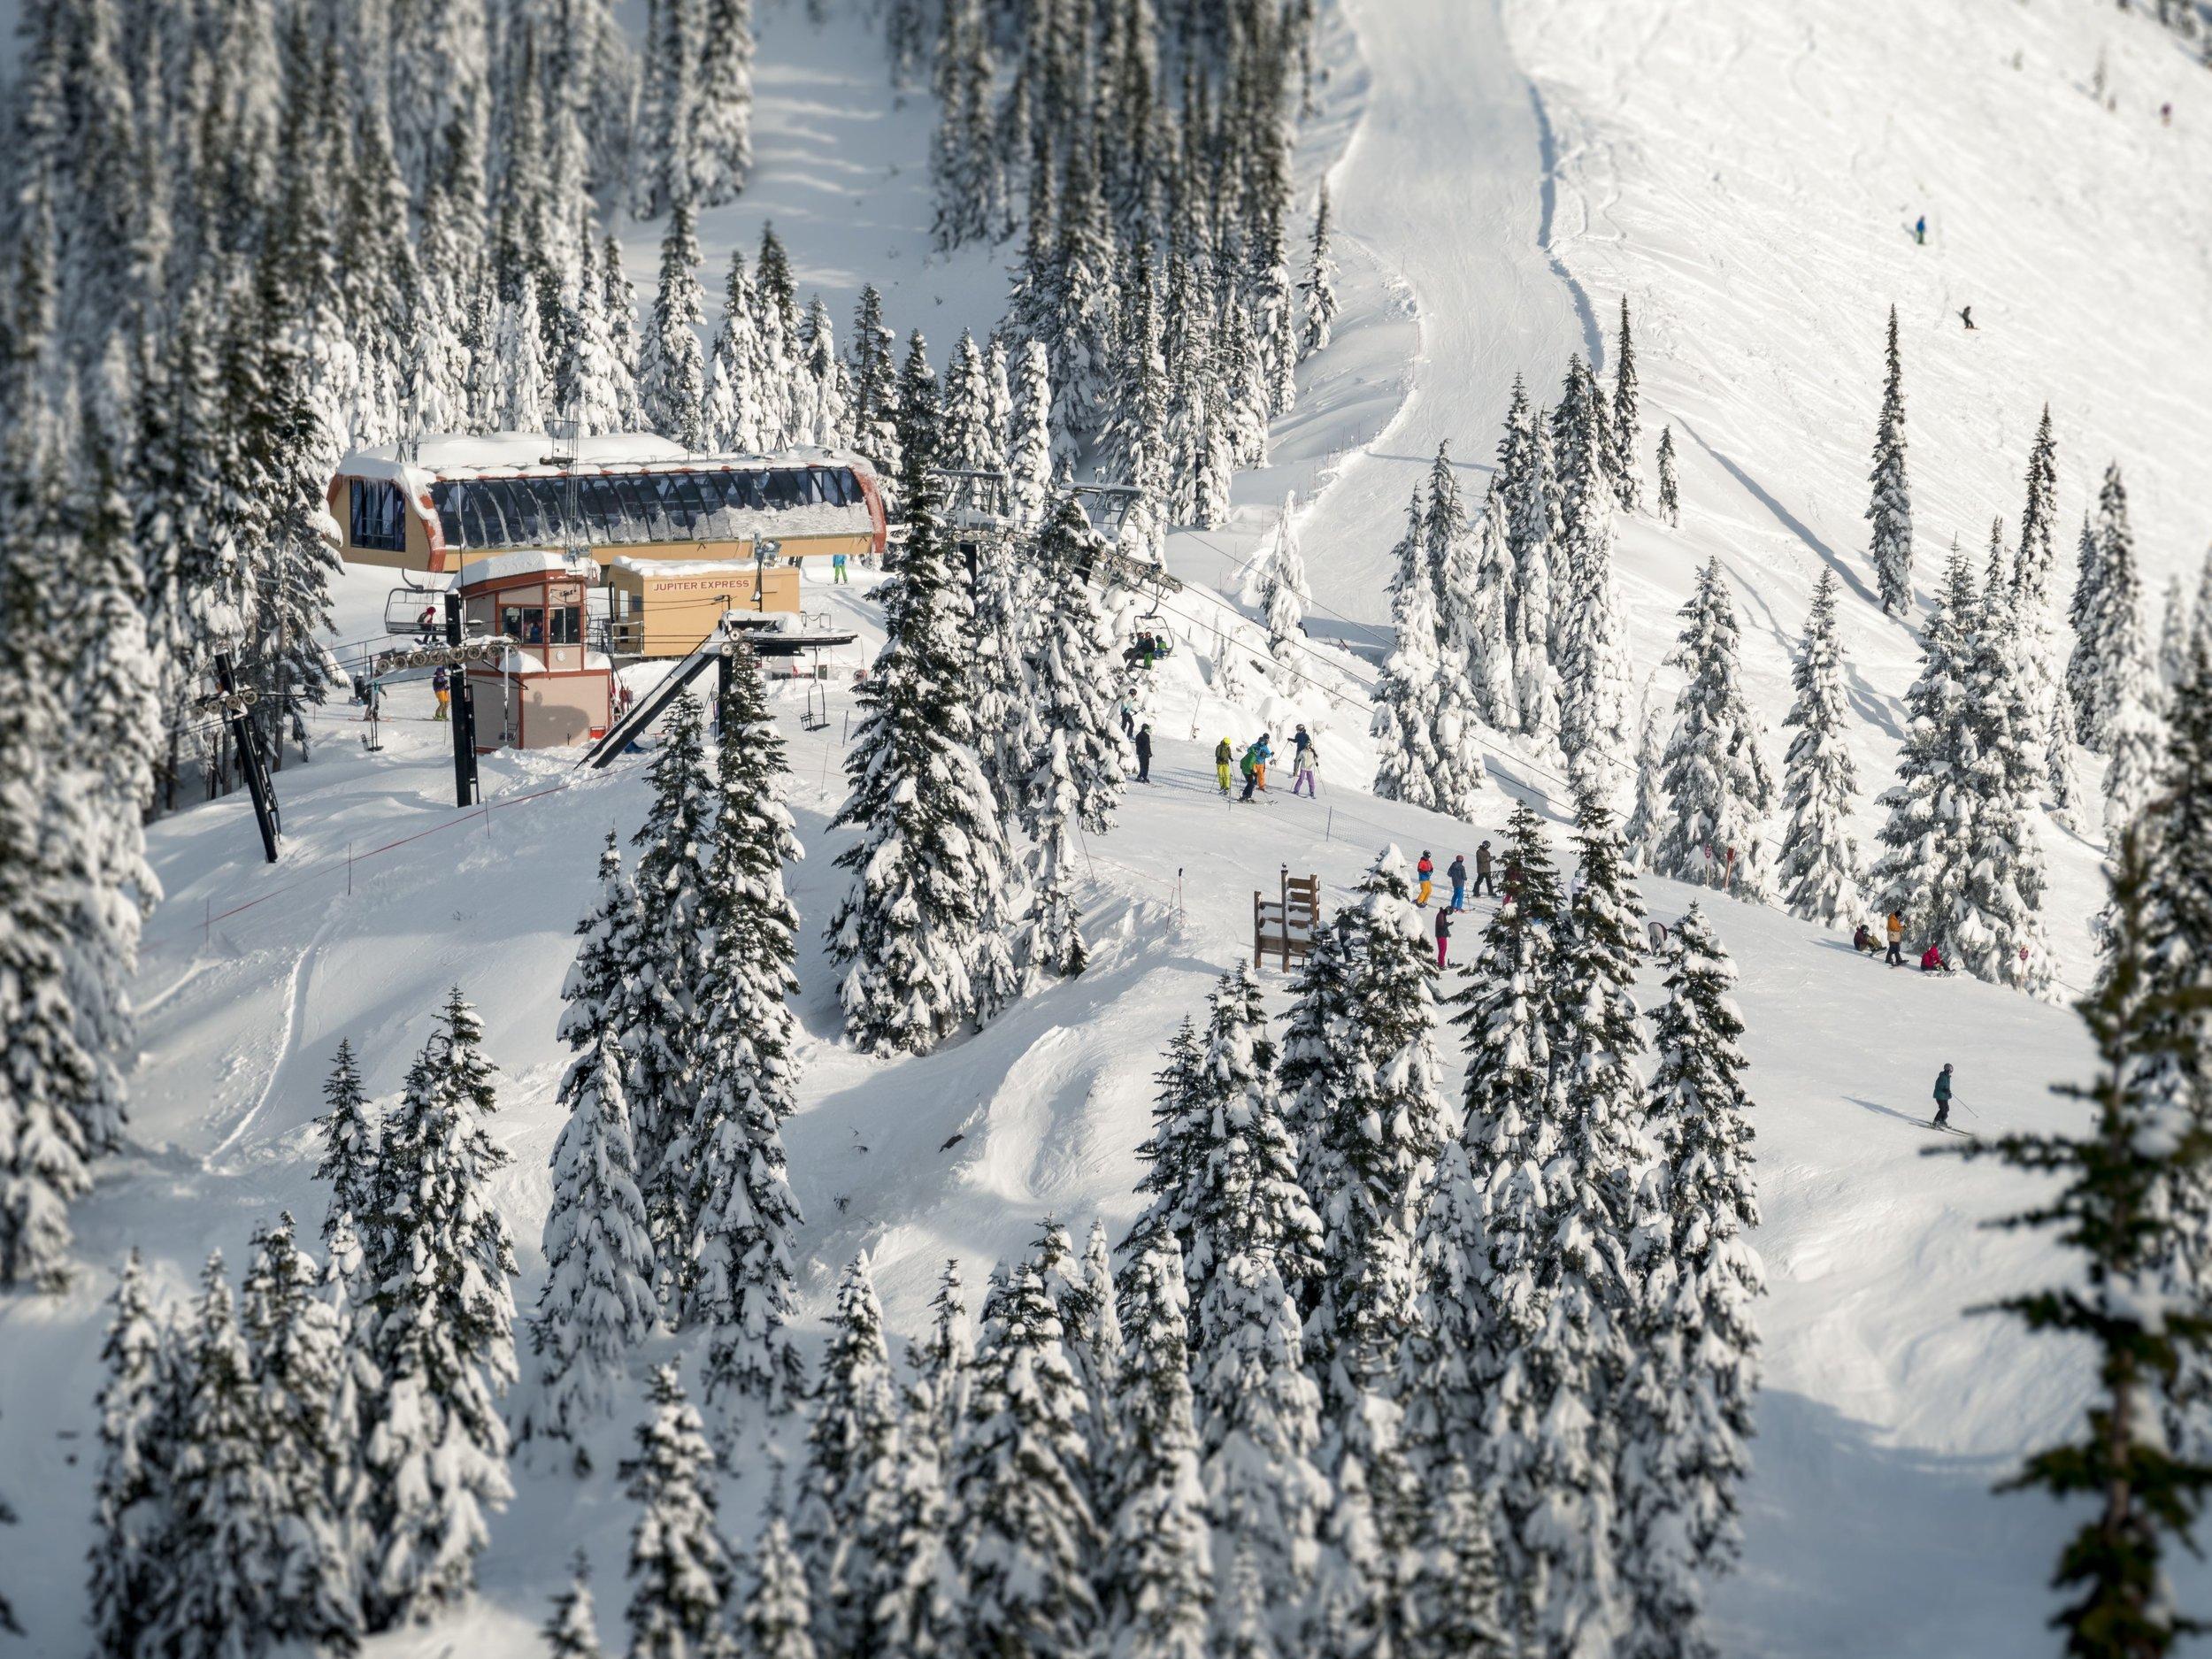 WInter_Mountain_Resort_Ski_Run_Chairlift.jpg